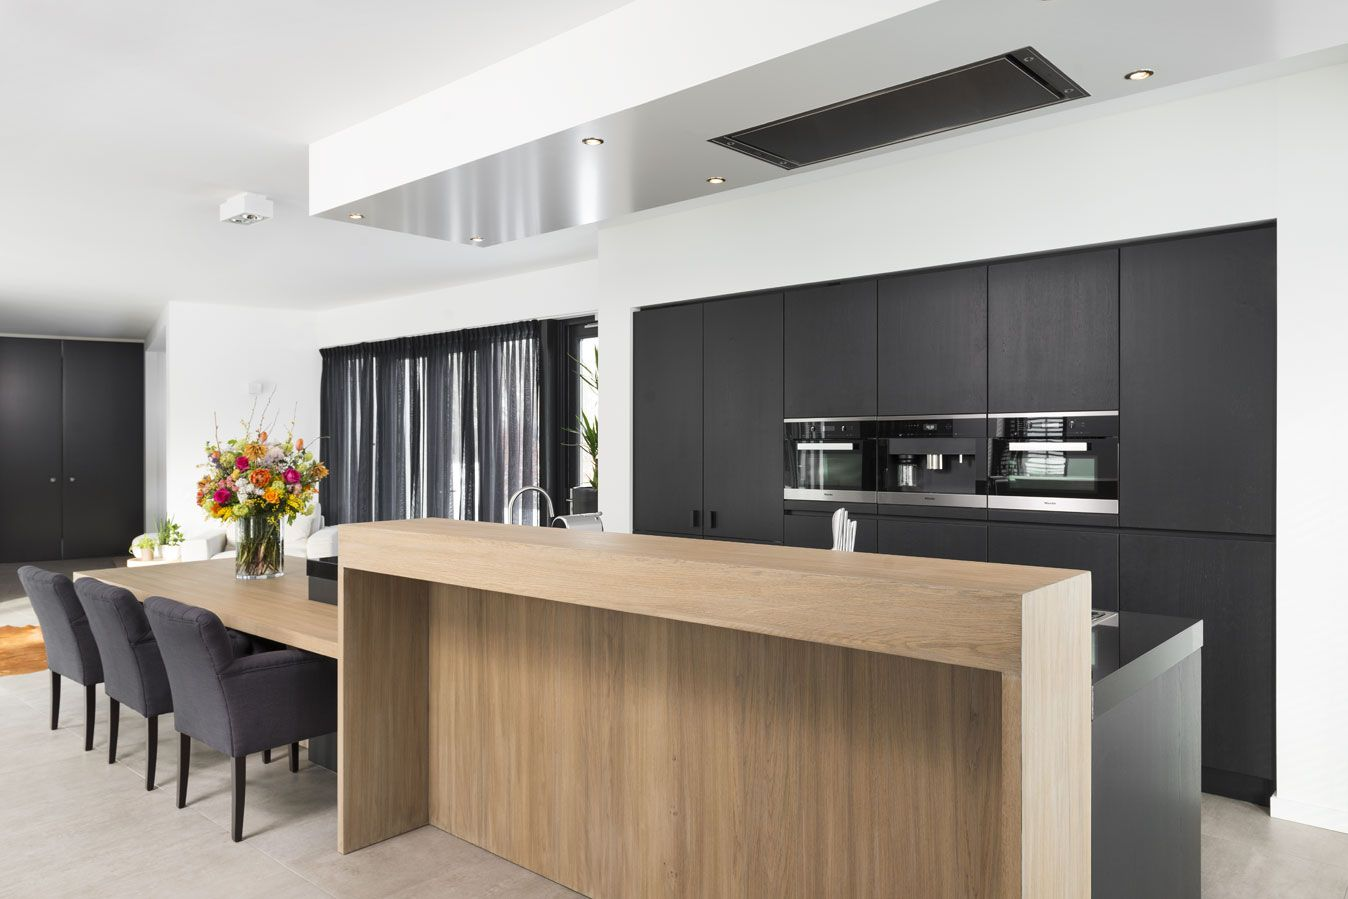 Keuken bar design moderne keuken met strakke houten bar